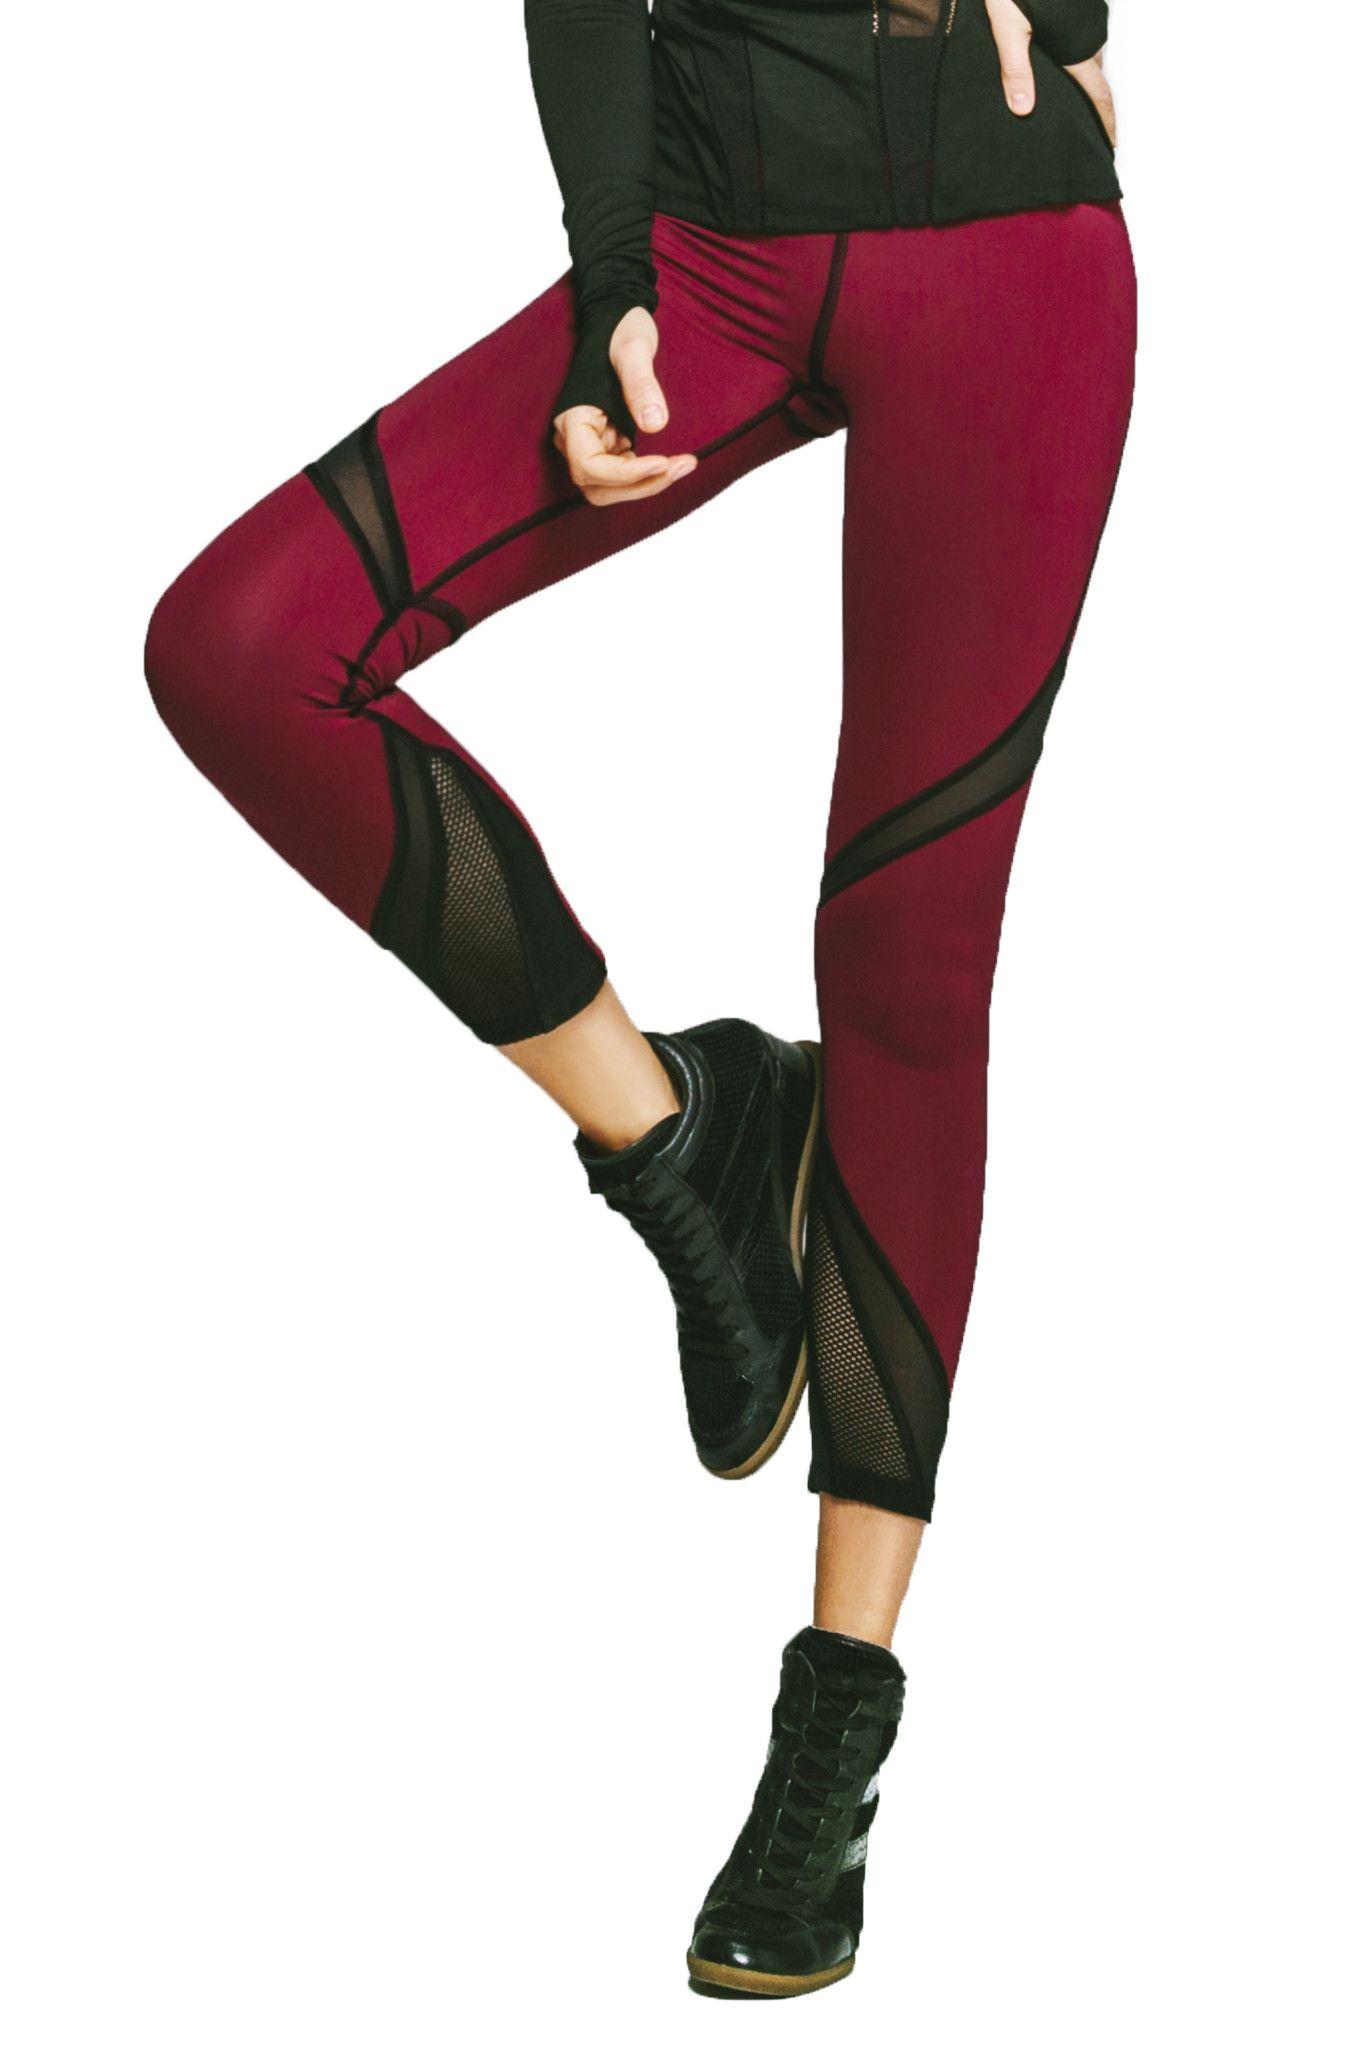 8a95aa5ce6218 Radiate Crop Legging - Shiraz / Black | #SweatCouture | Fashion ...